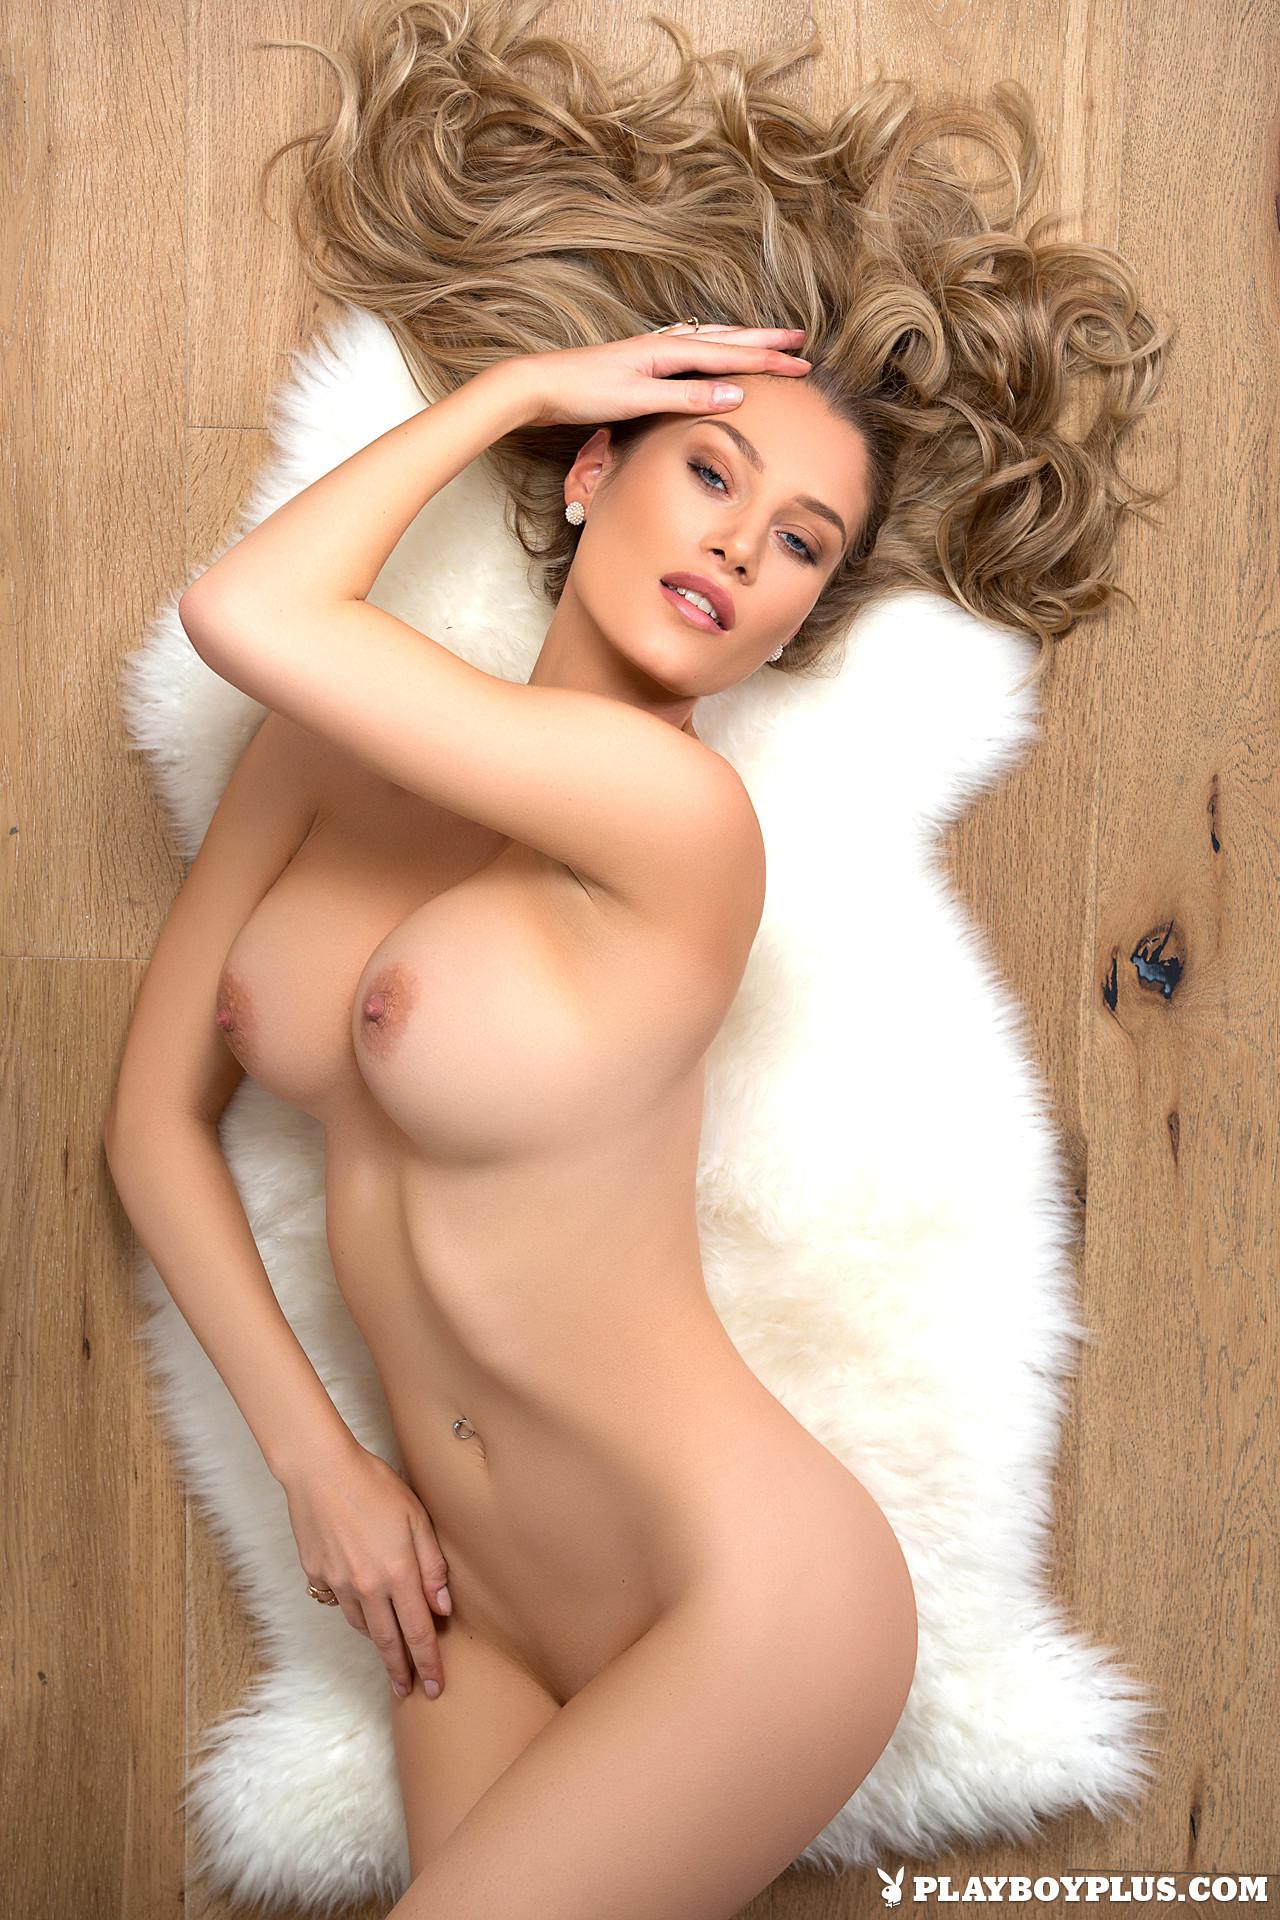 Babe Today Playboy Plus Anna Opsal Unlocked Scandinavian -2090